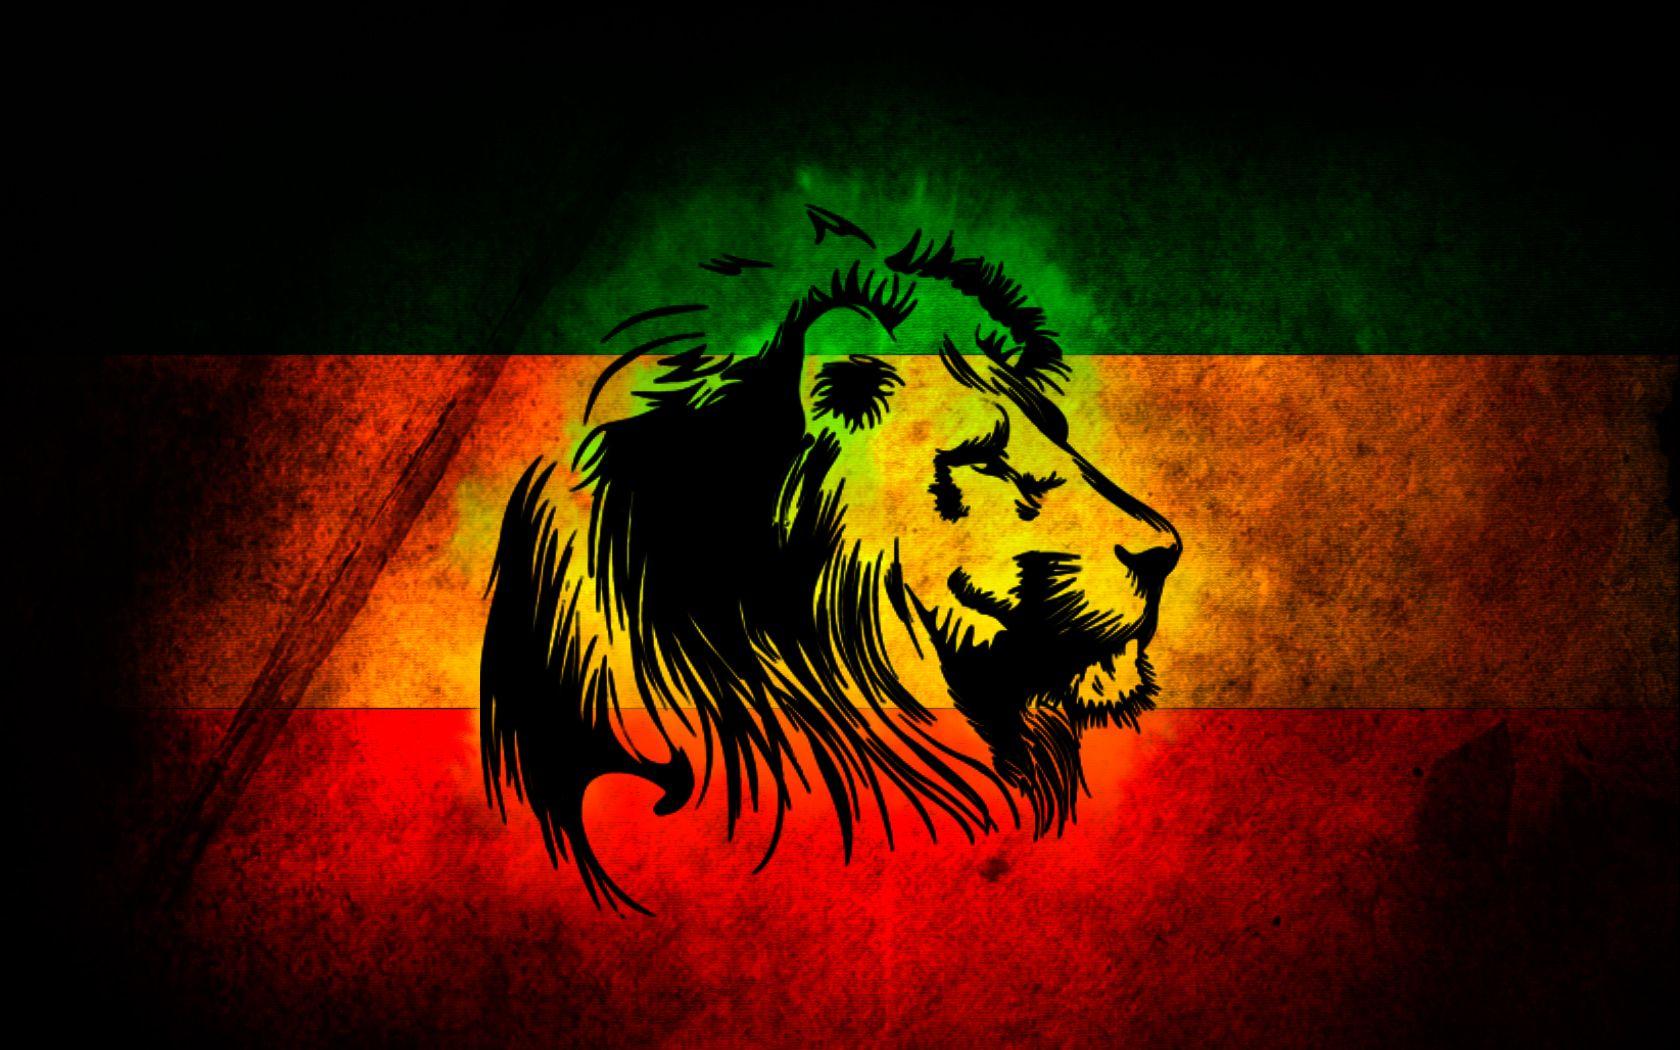 Lion Reggae Jamaica Roots Rock Reggae 34377070 1680 1050 Jpg 1680